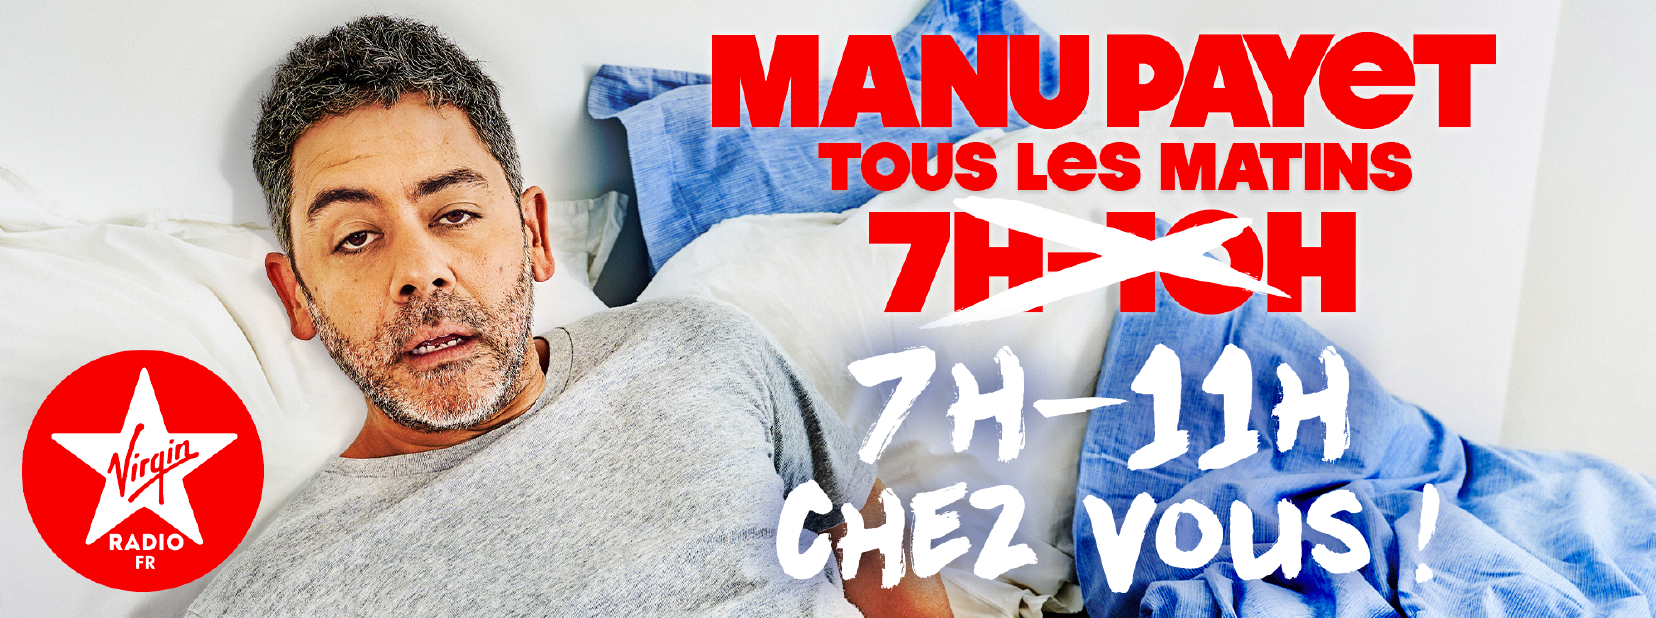 "Manu Payet ""radiotravaille"" jusqu'à 11h sur Virgin Radio"